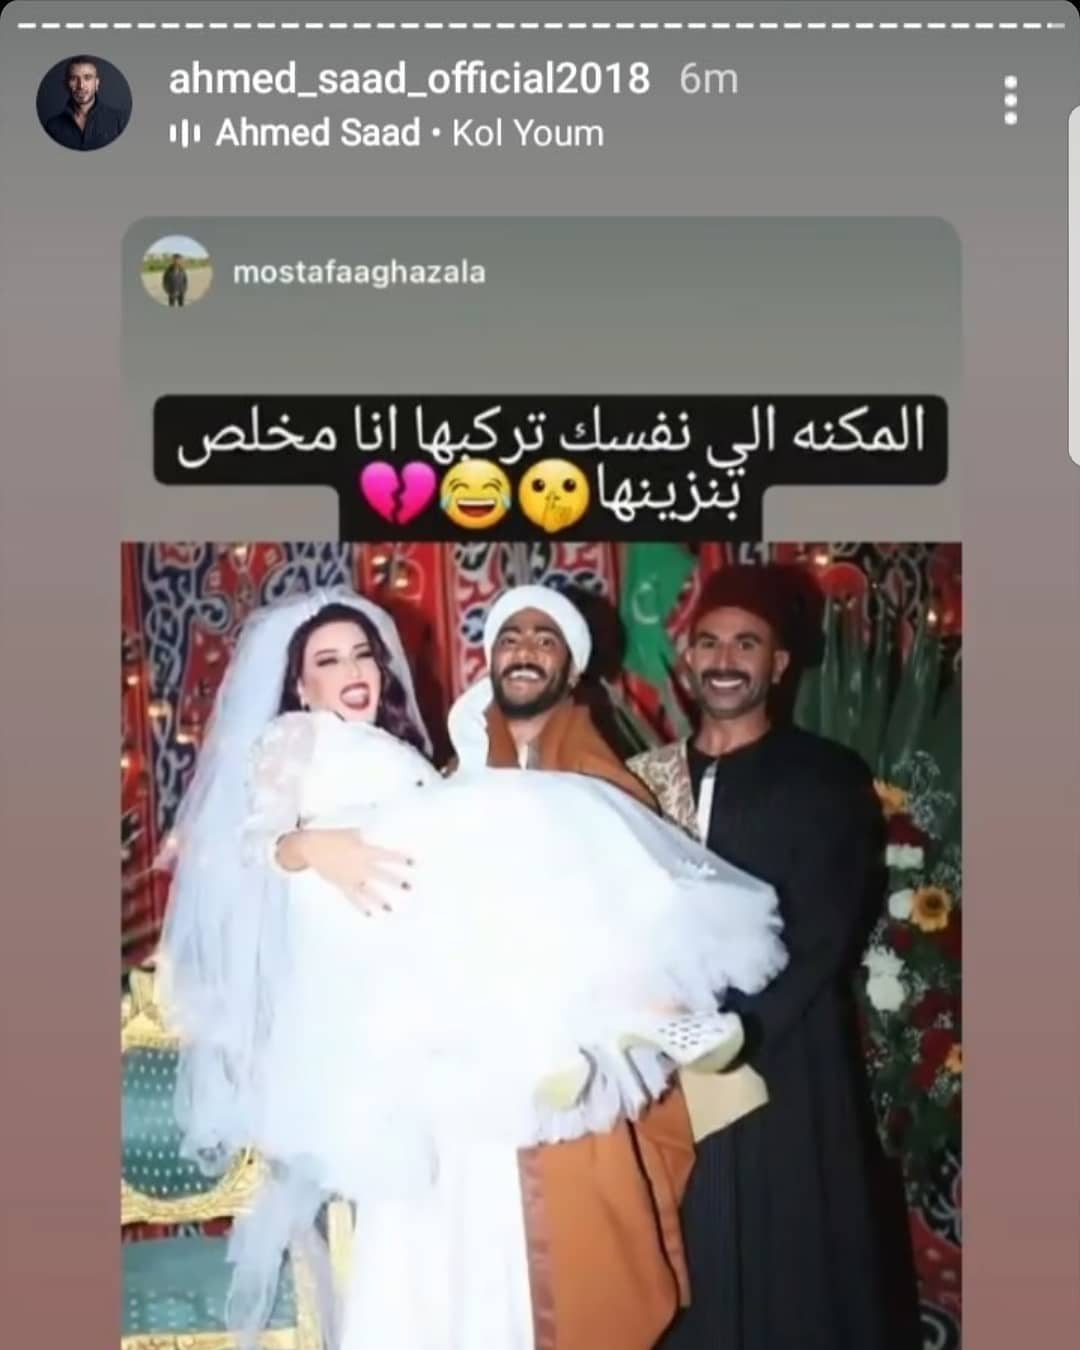 Ahmed Saad Posts Sexual Insult of Ex-Wife Somaya El-Khashab mohamed ramadan